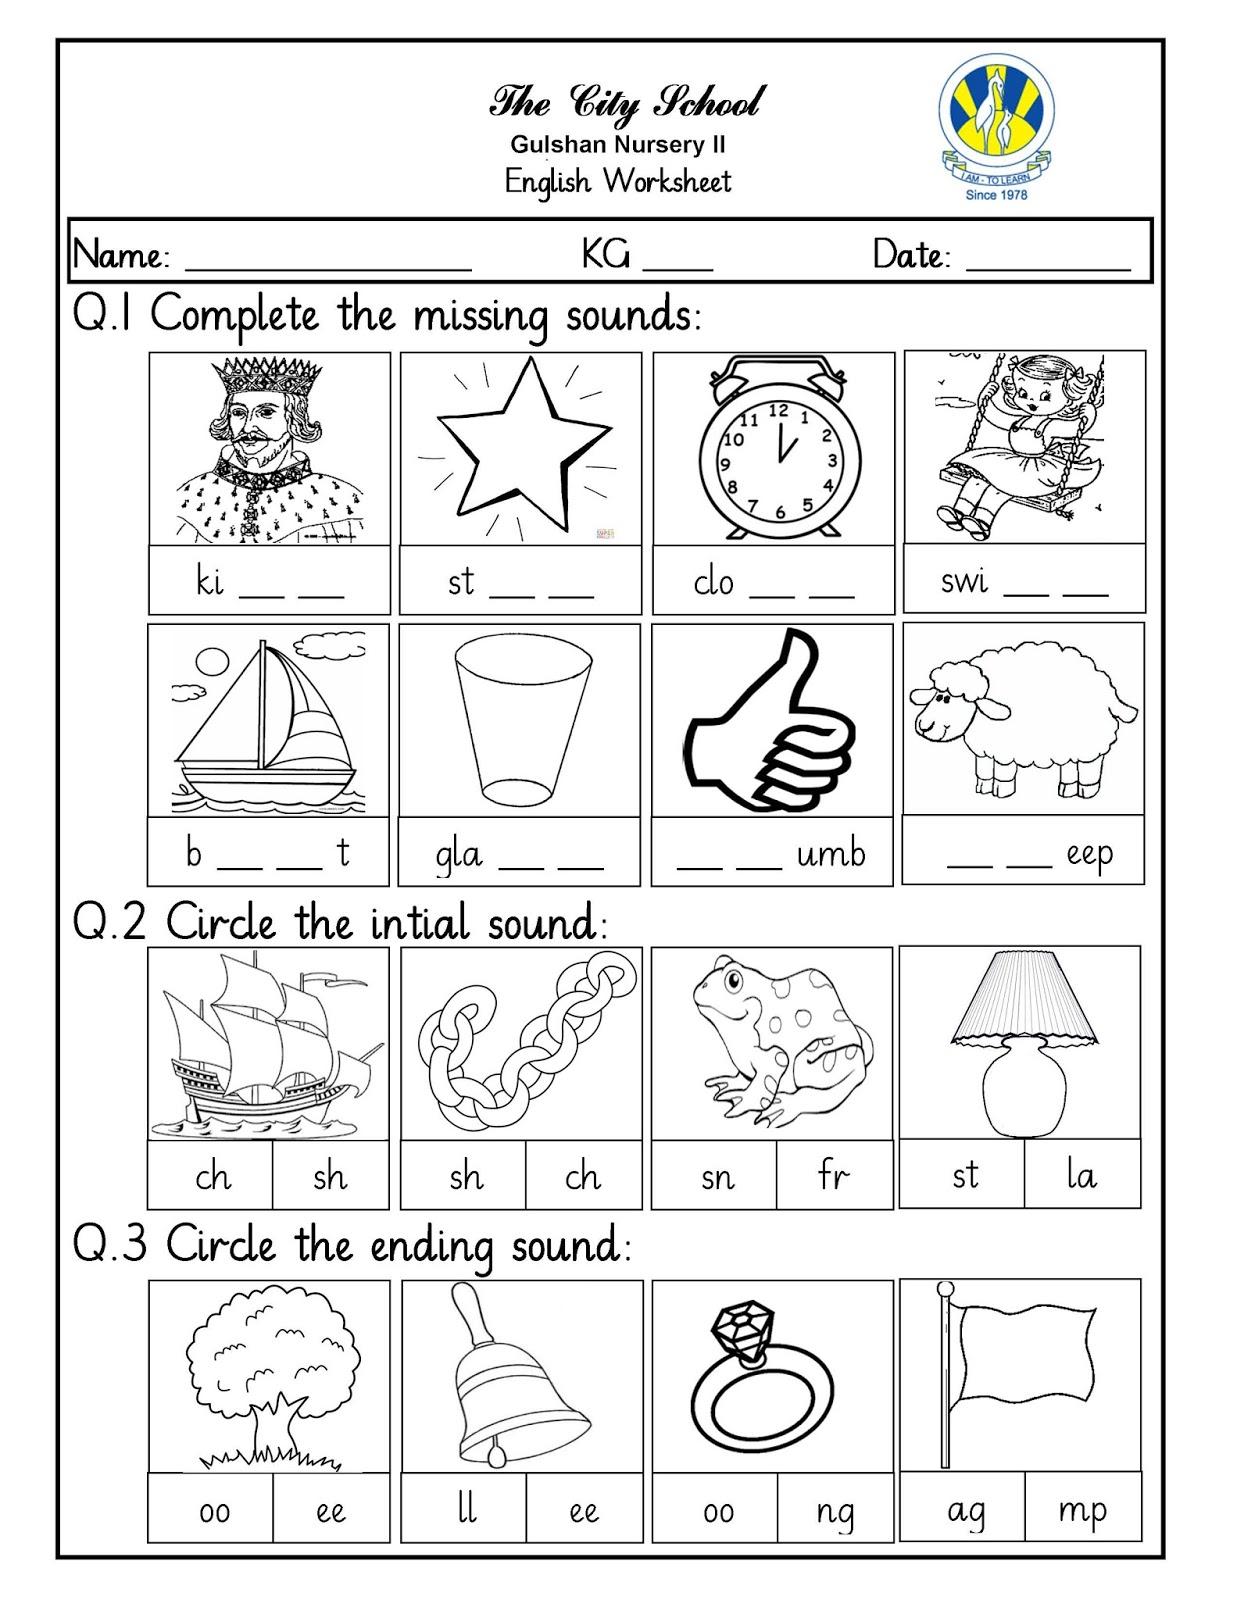 SR Gulshan The City Nursery-II: English, KUWA and Math Worksheets